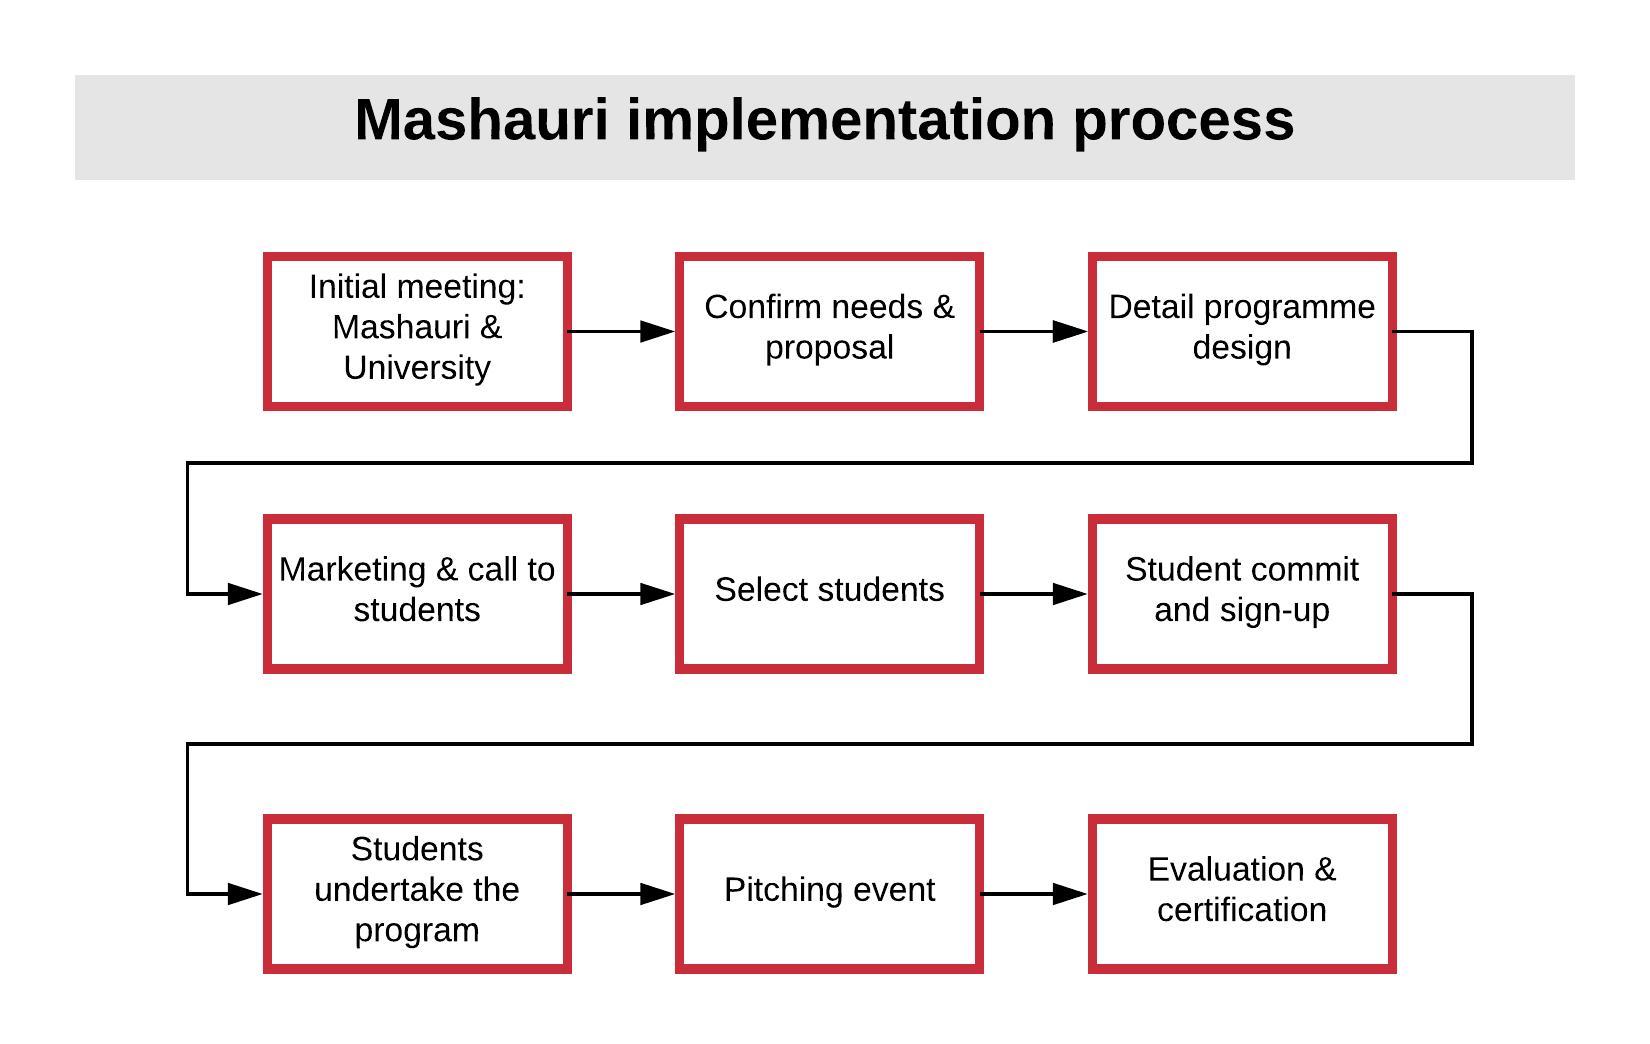 Mashauri implementation process